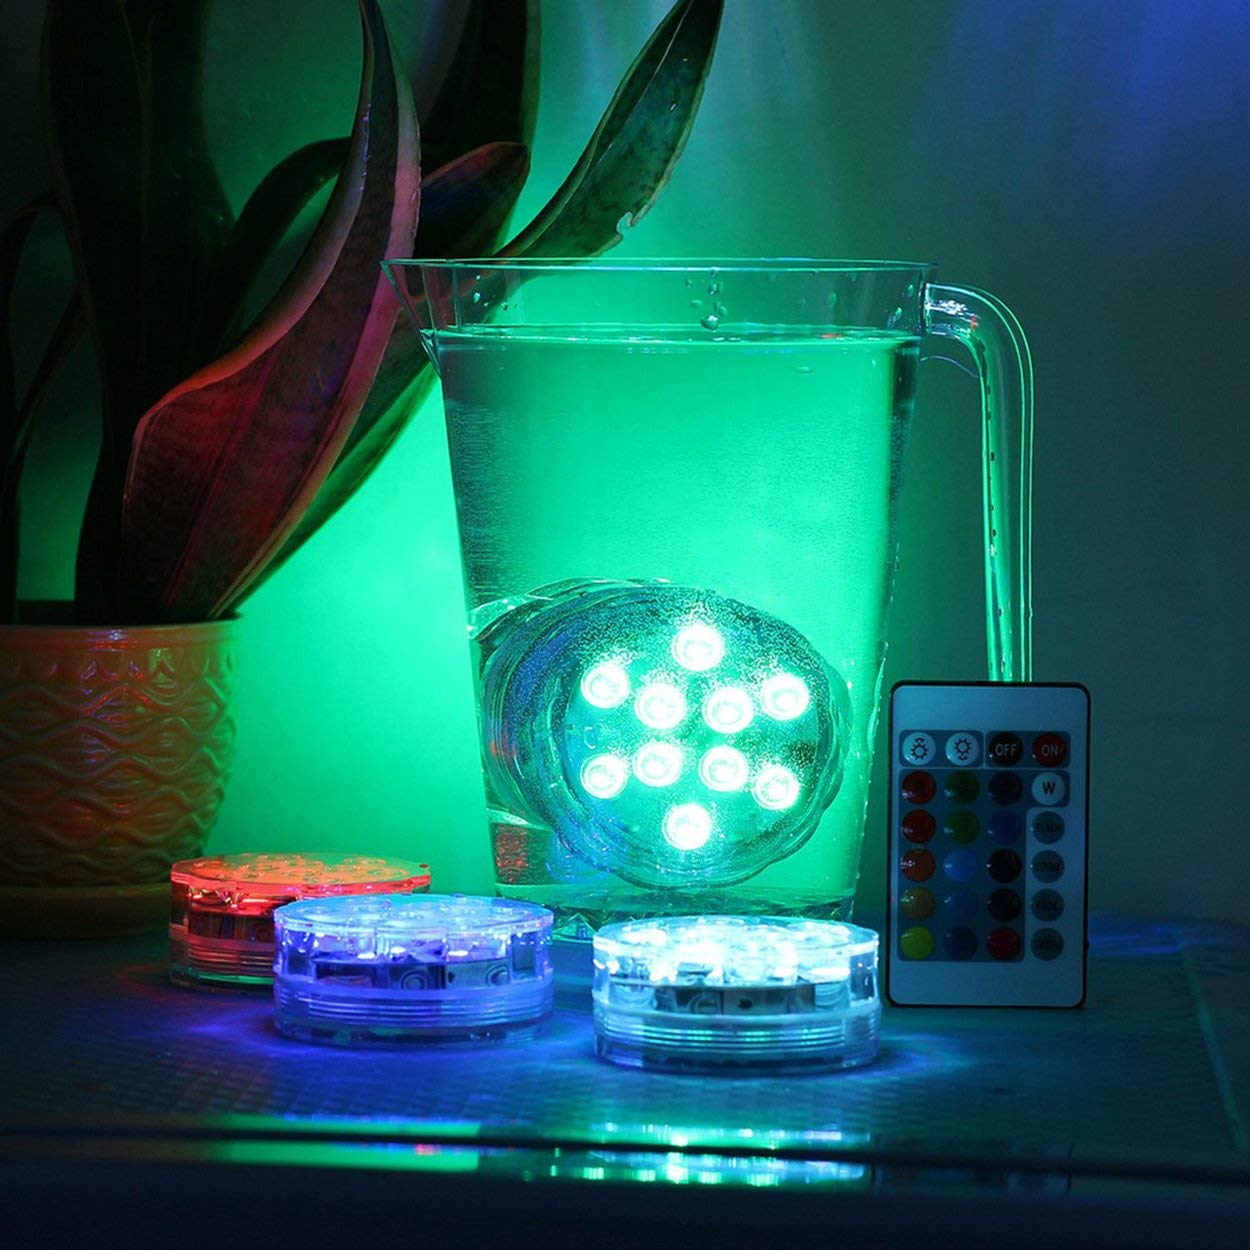 Lorenlli Luz de Piscina con Control Remoto Bombilla Sumergible LED RGB Bombilla LED Durable L/ámpara de Noche subacu/ática port/átil